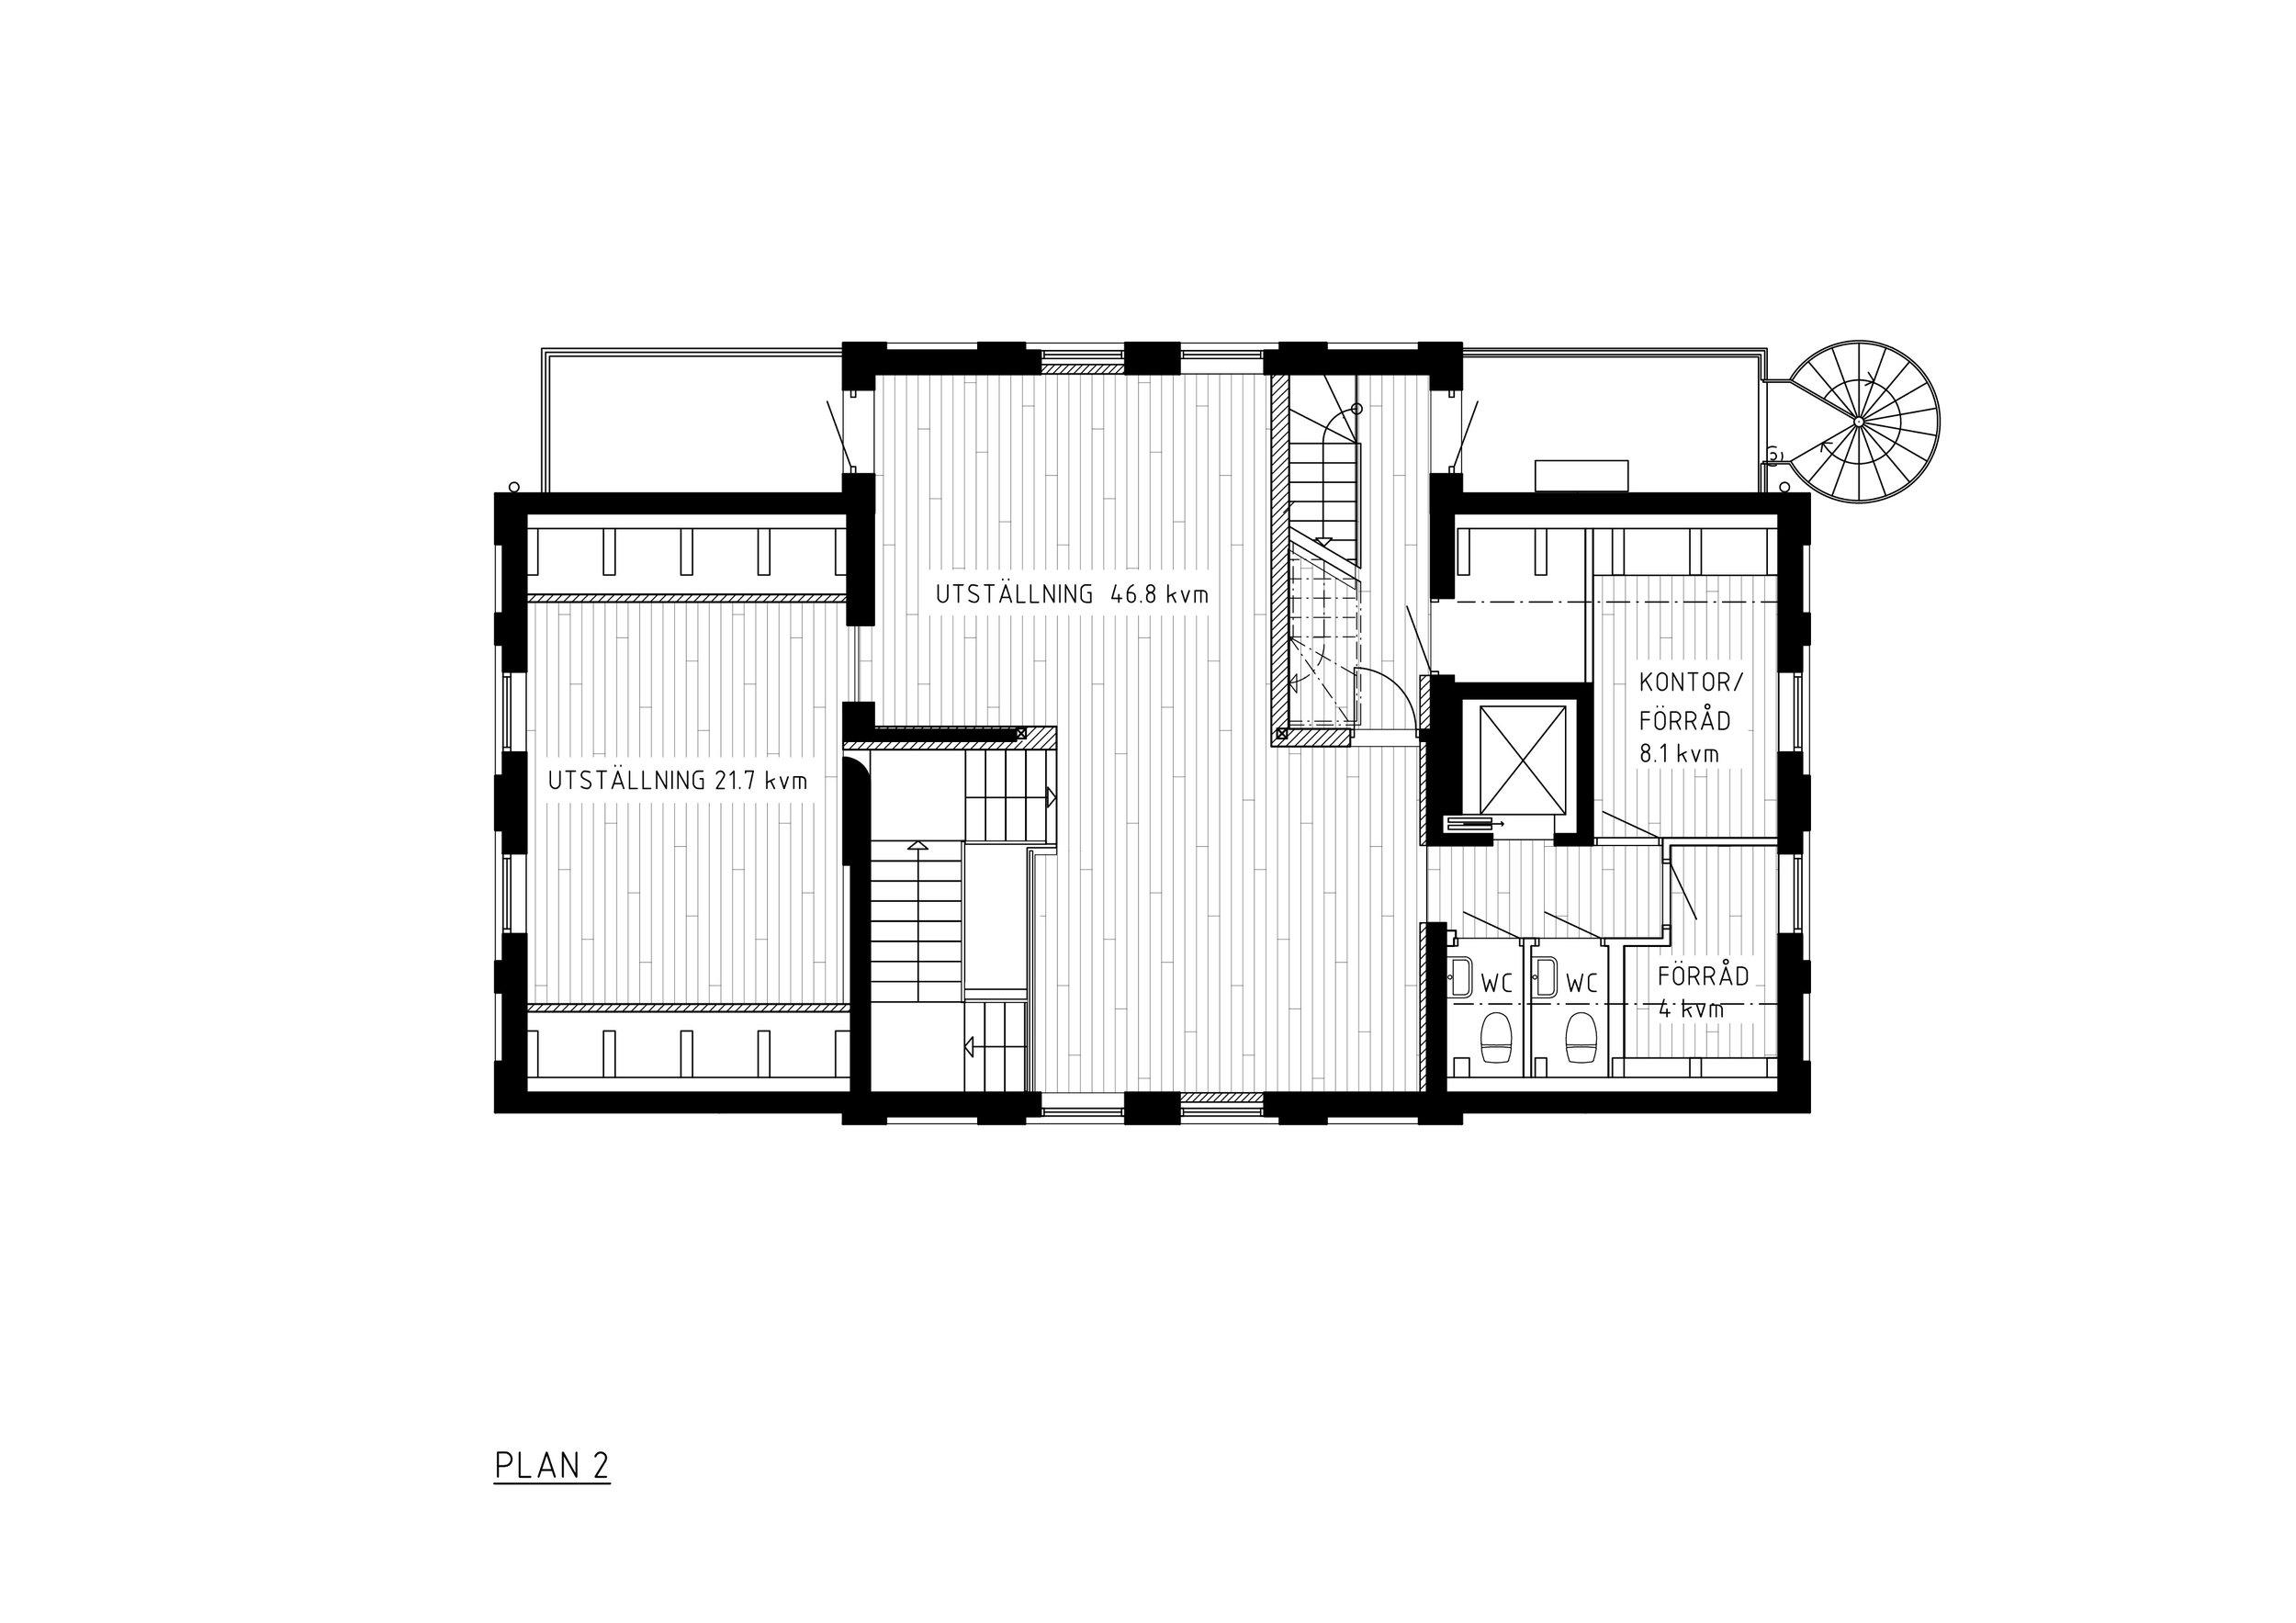 FalsterboKonsthall plan 2.jpg